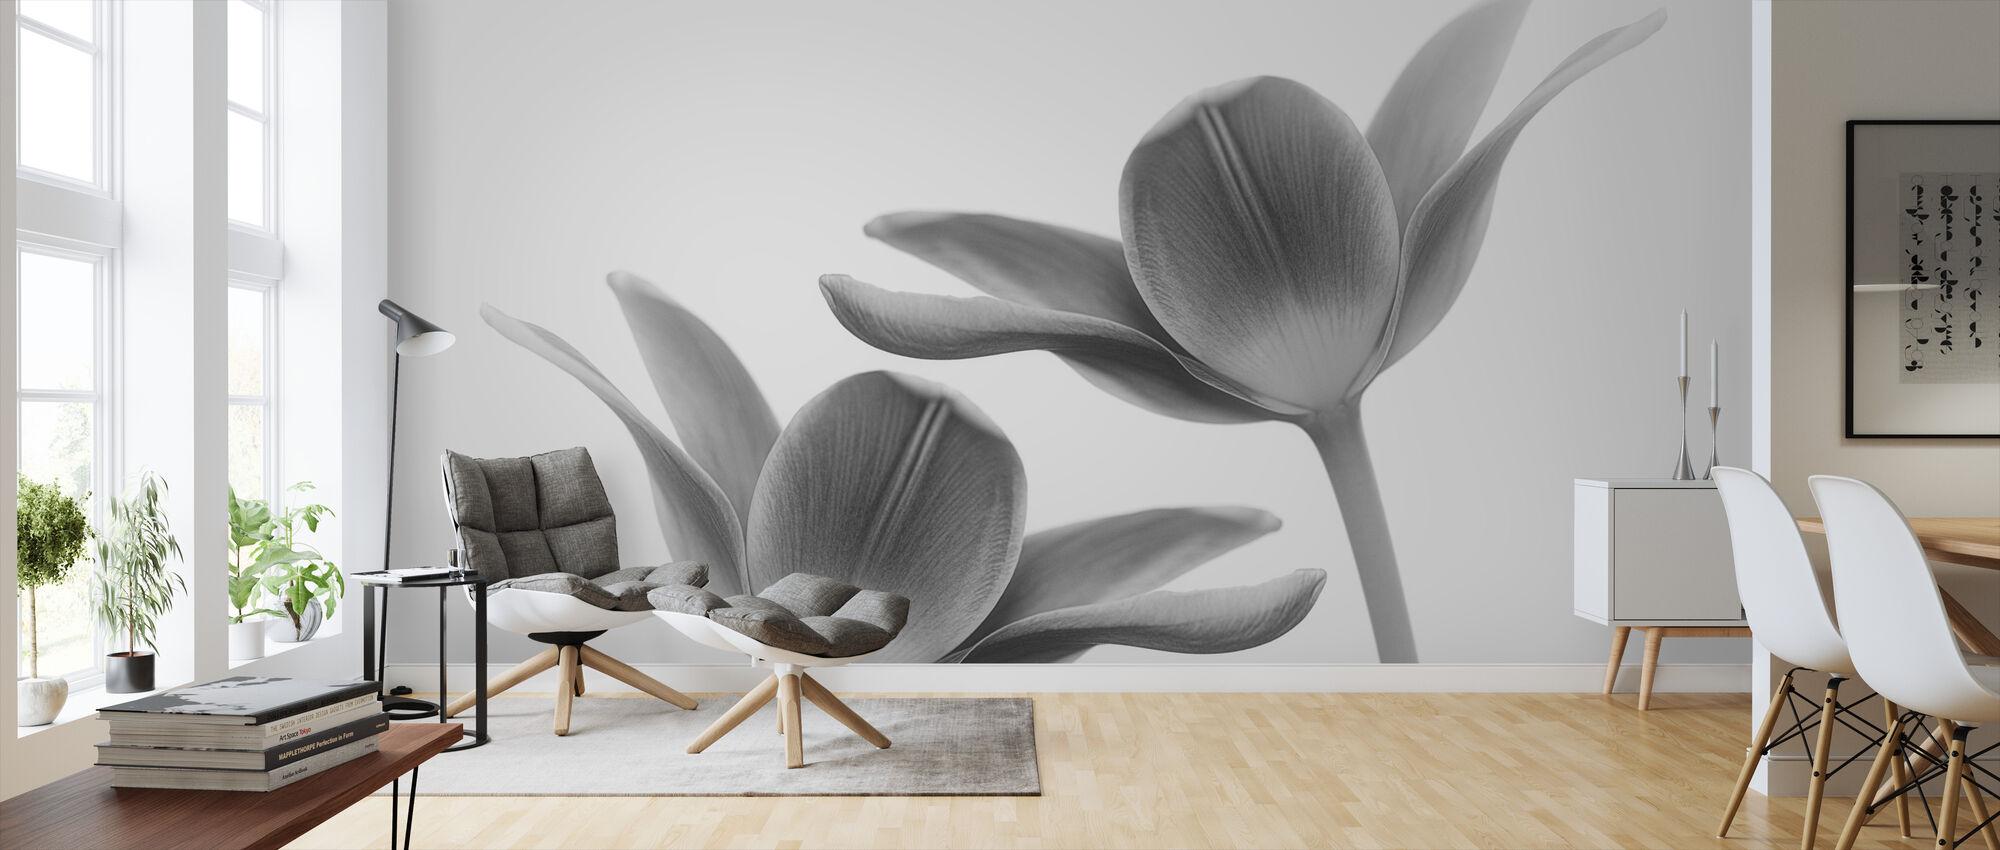 Twice the Same - Wallpaper - Living Room